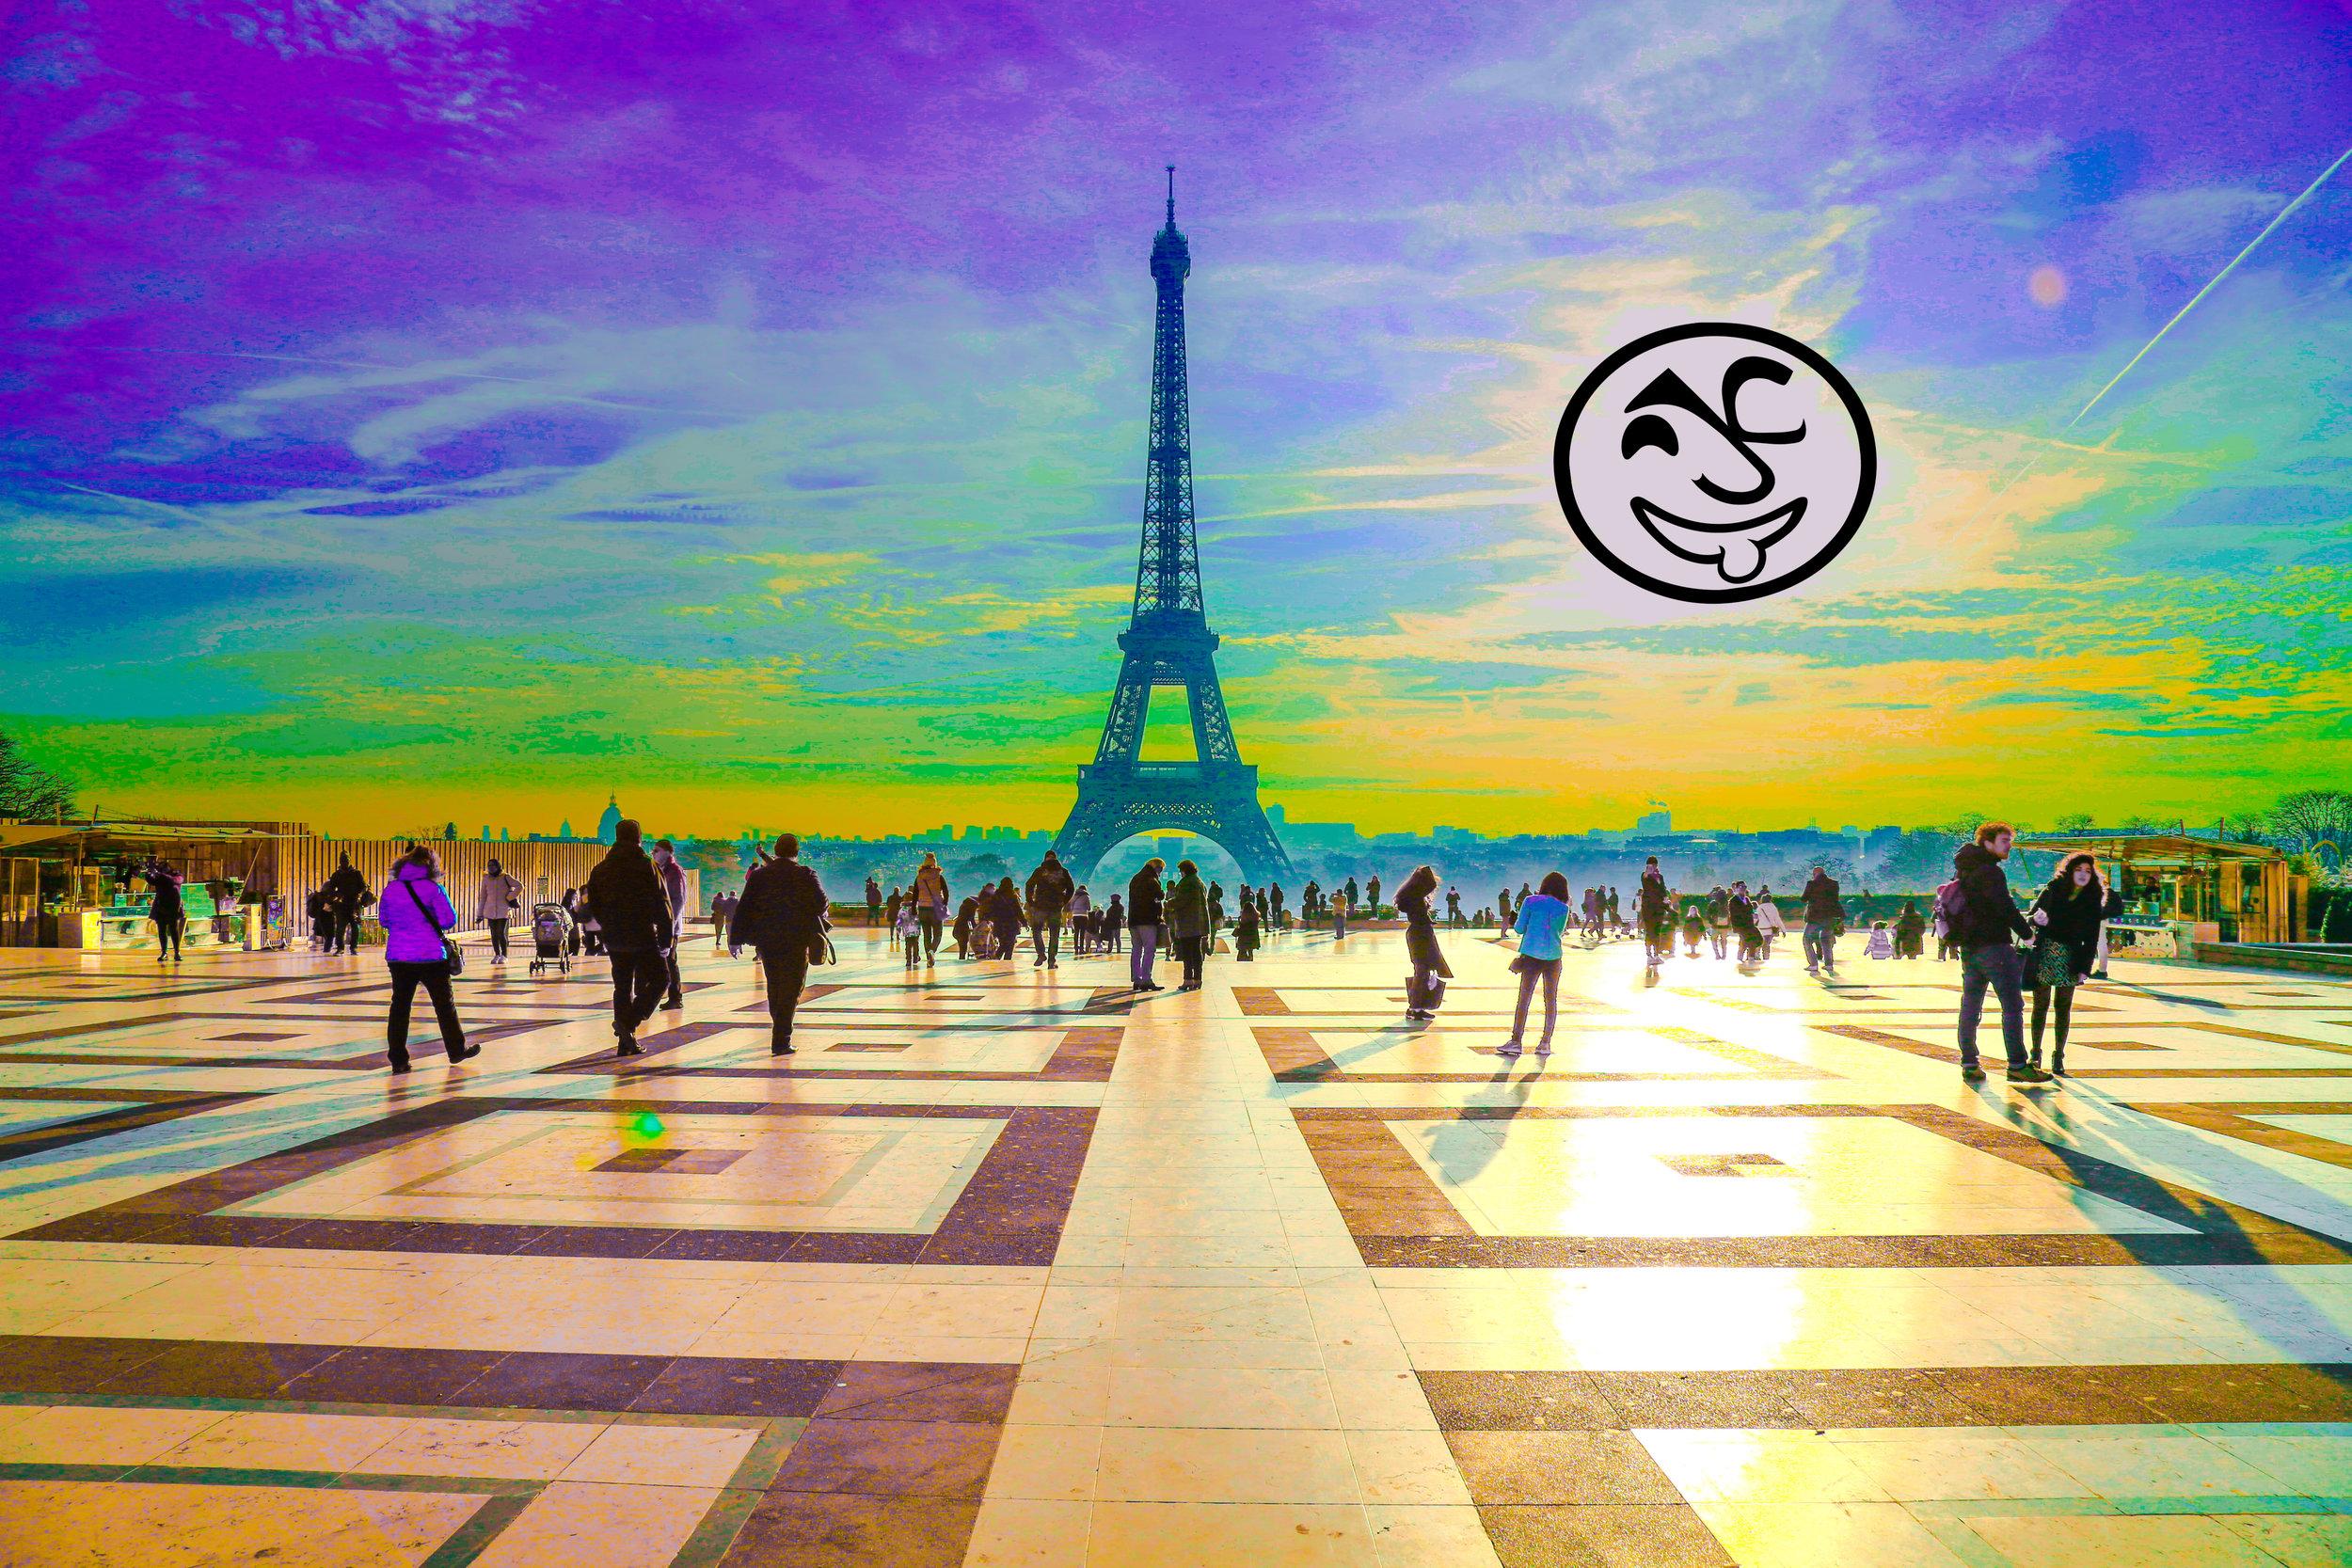 Colorful_Sky_Eiffel_Tower_wLogo.jpg